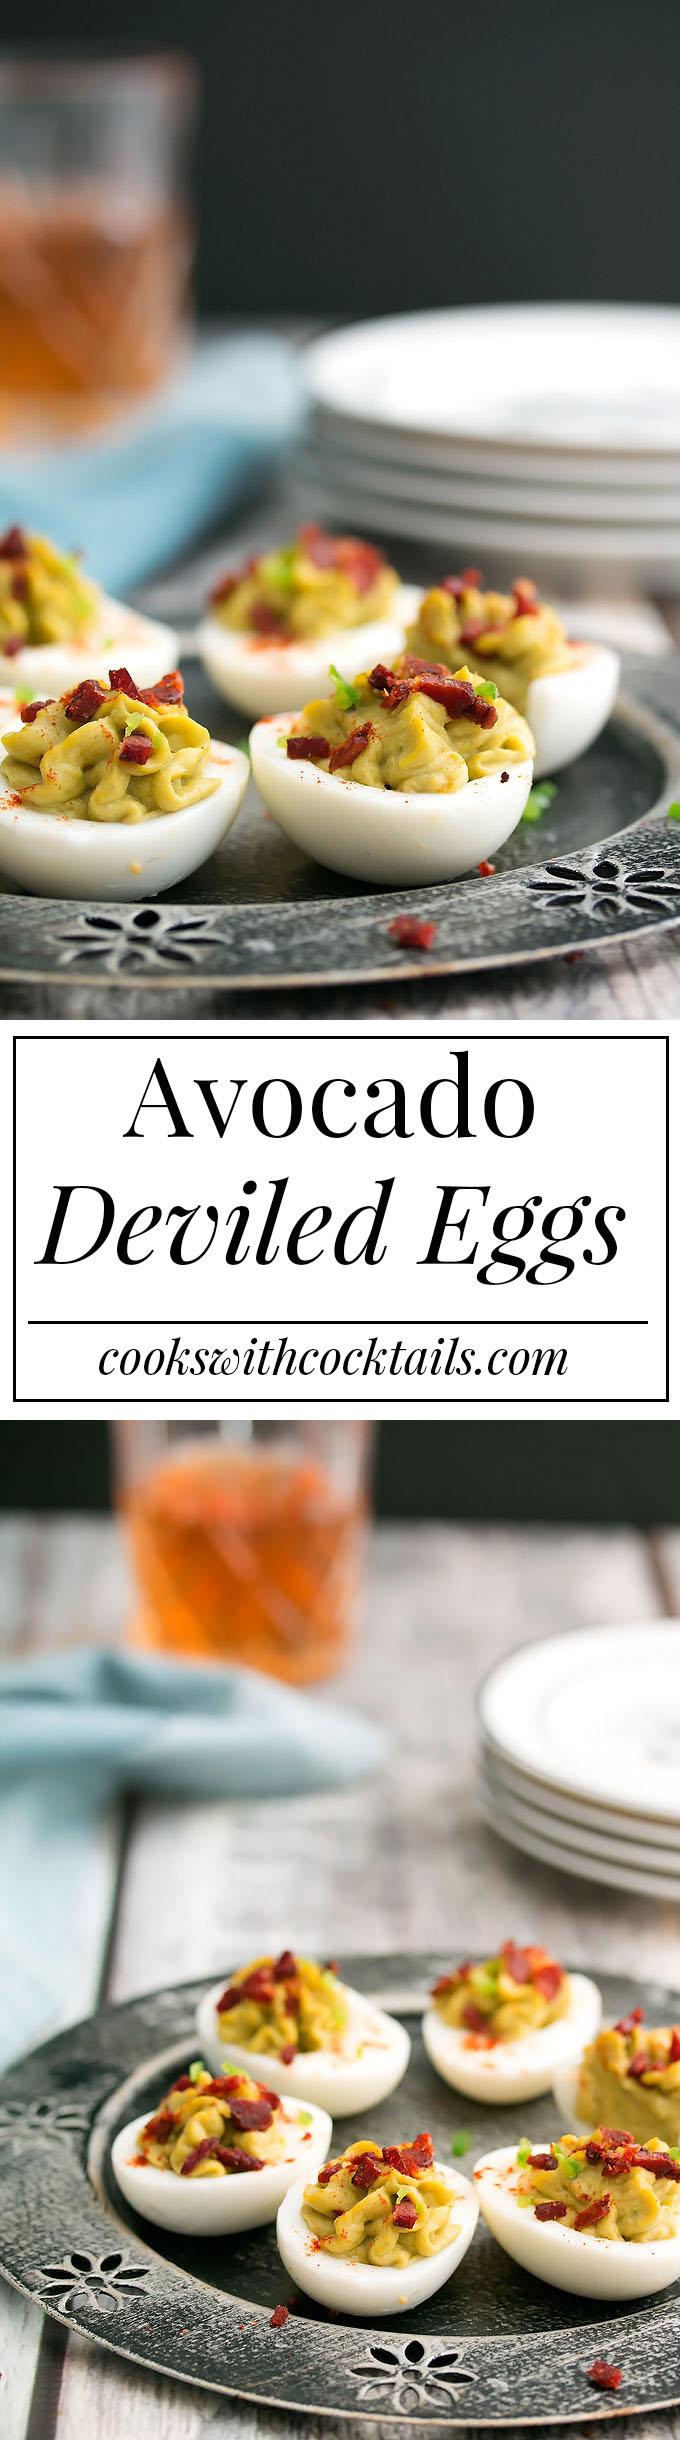 Avocado, Jalapeno & Bacon Deviled Eggs & the Hard Boiled Egg Trick